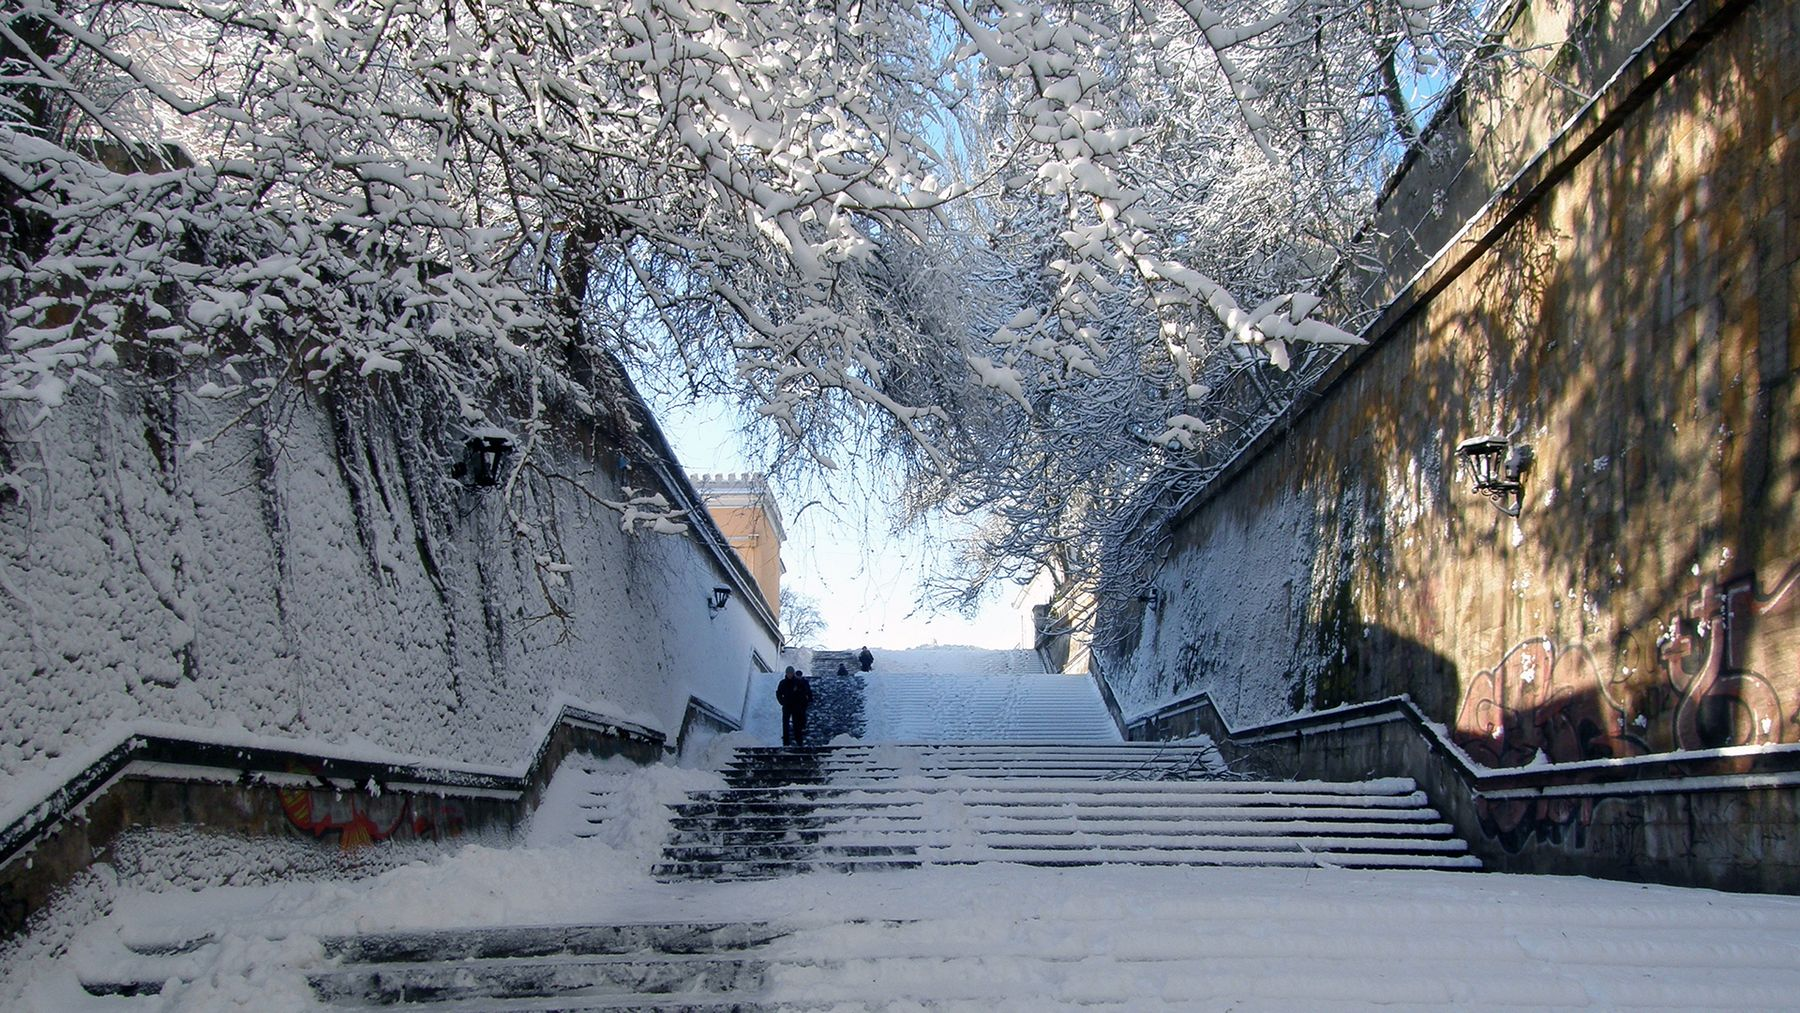 *** Ланжероновский спуск зима снег лестница